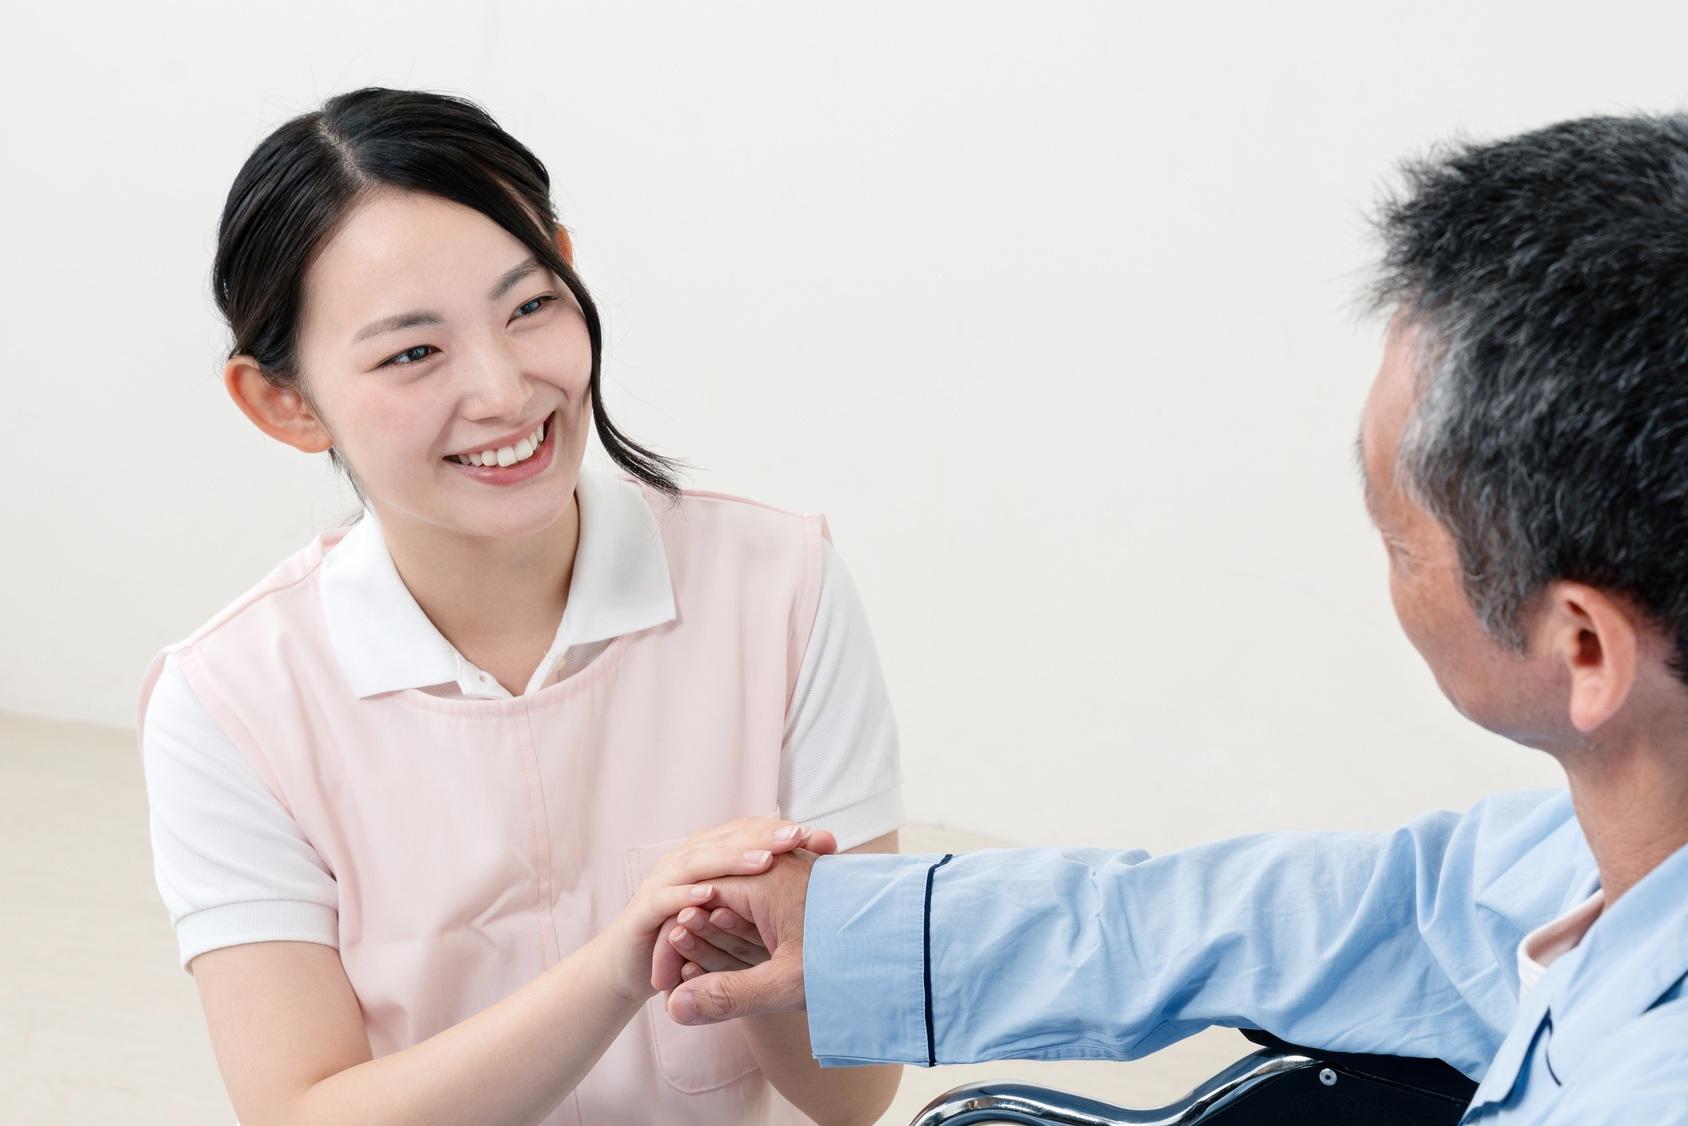 दया र मायाका साथ नर्सिङ्ग पेस बिकशित गरॊऊ। /優しく看護を進化させていきましょう